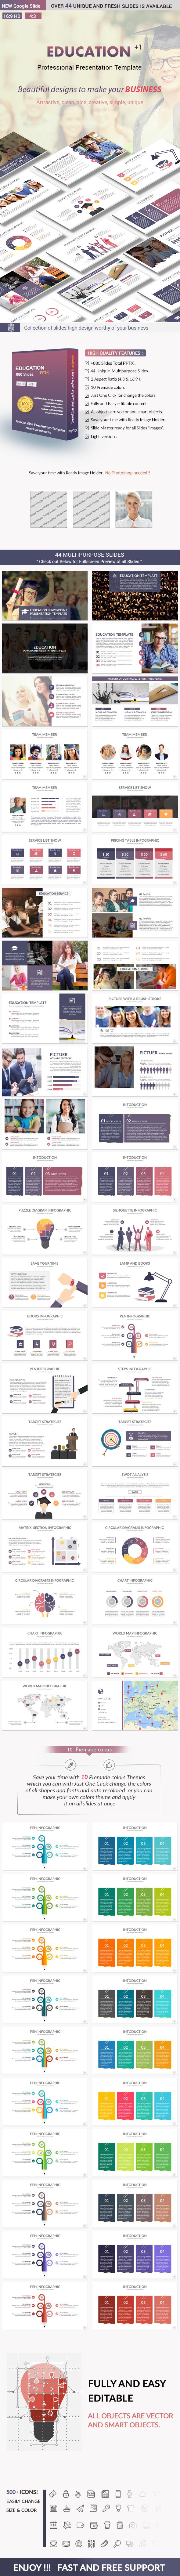 Education Google slides Presentation Template - Google Slides Presentation Templates